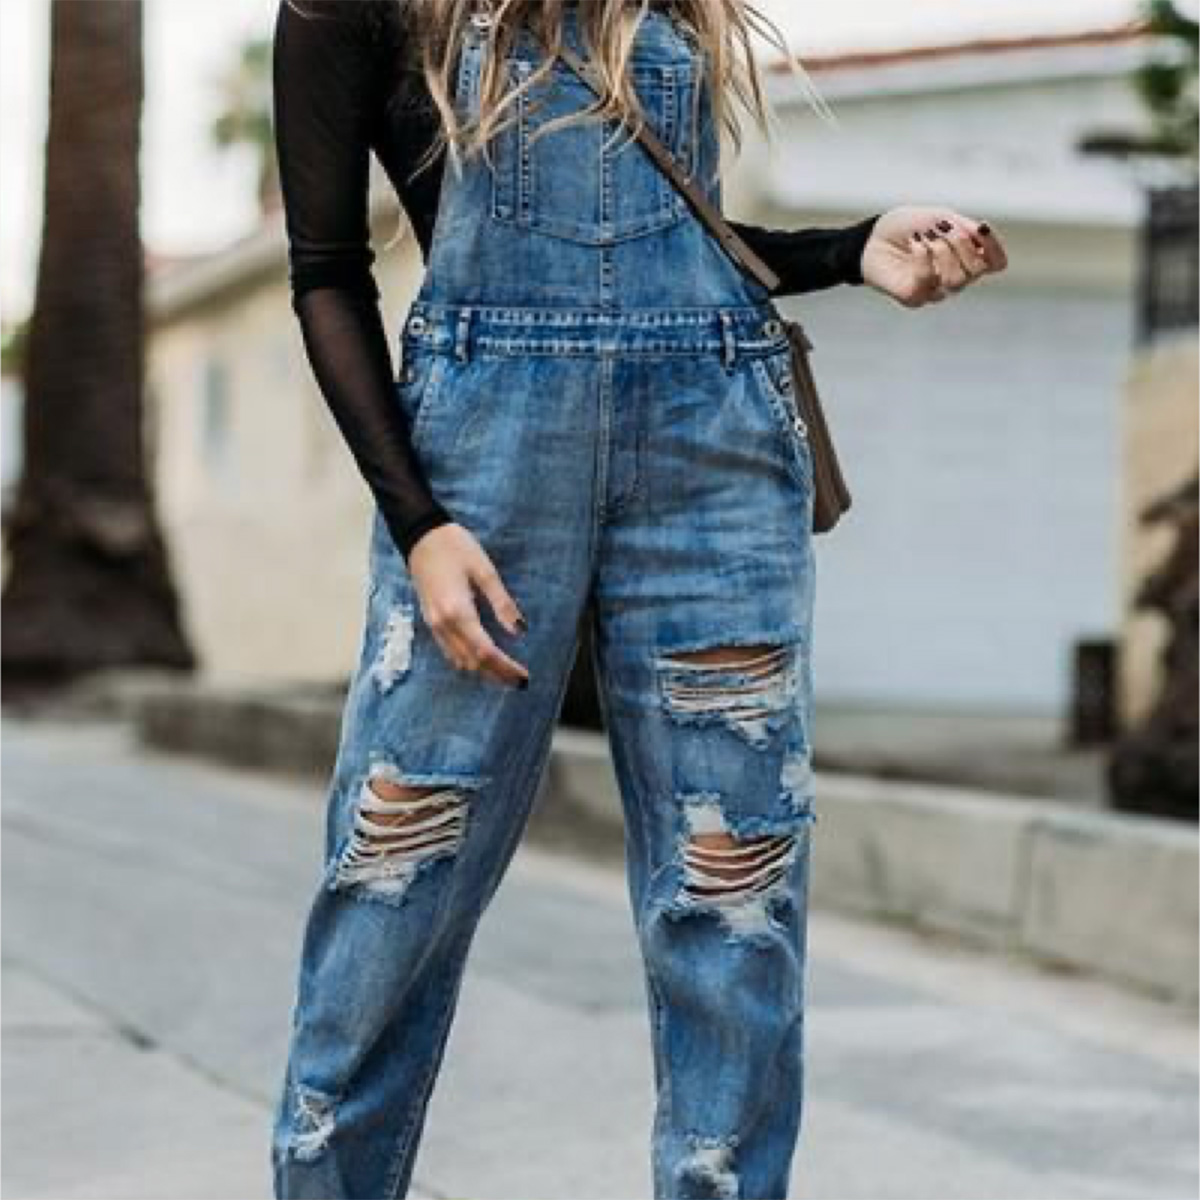 Country Denim Clothing | Fashion Estb #countrydenim #womensclothing #fashion